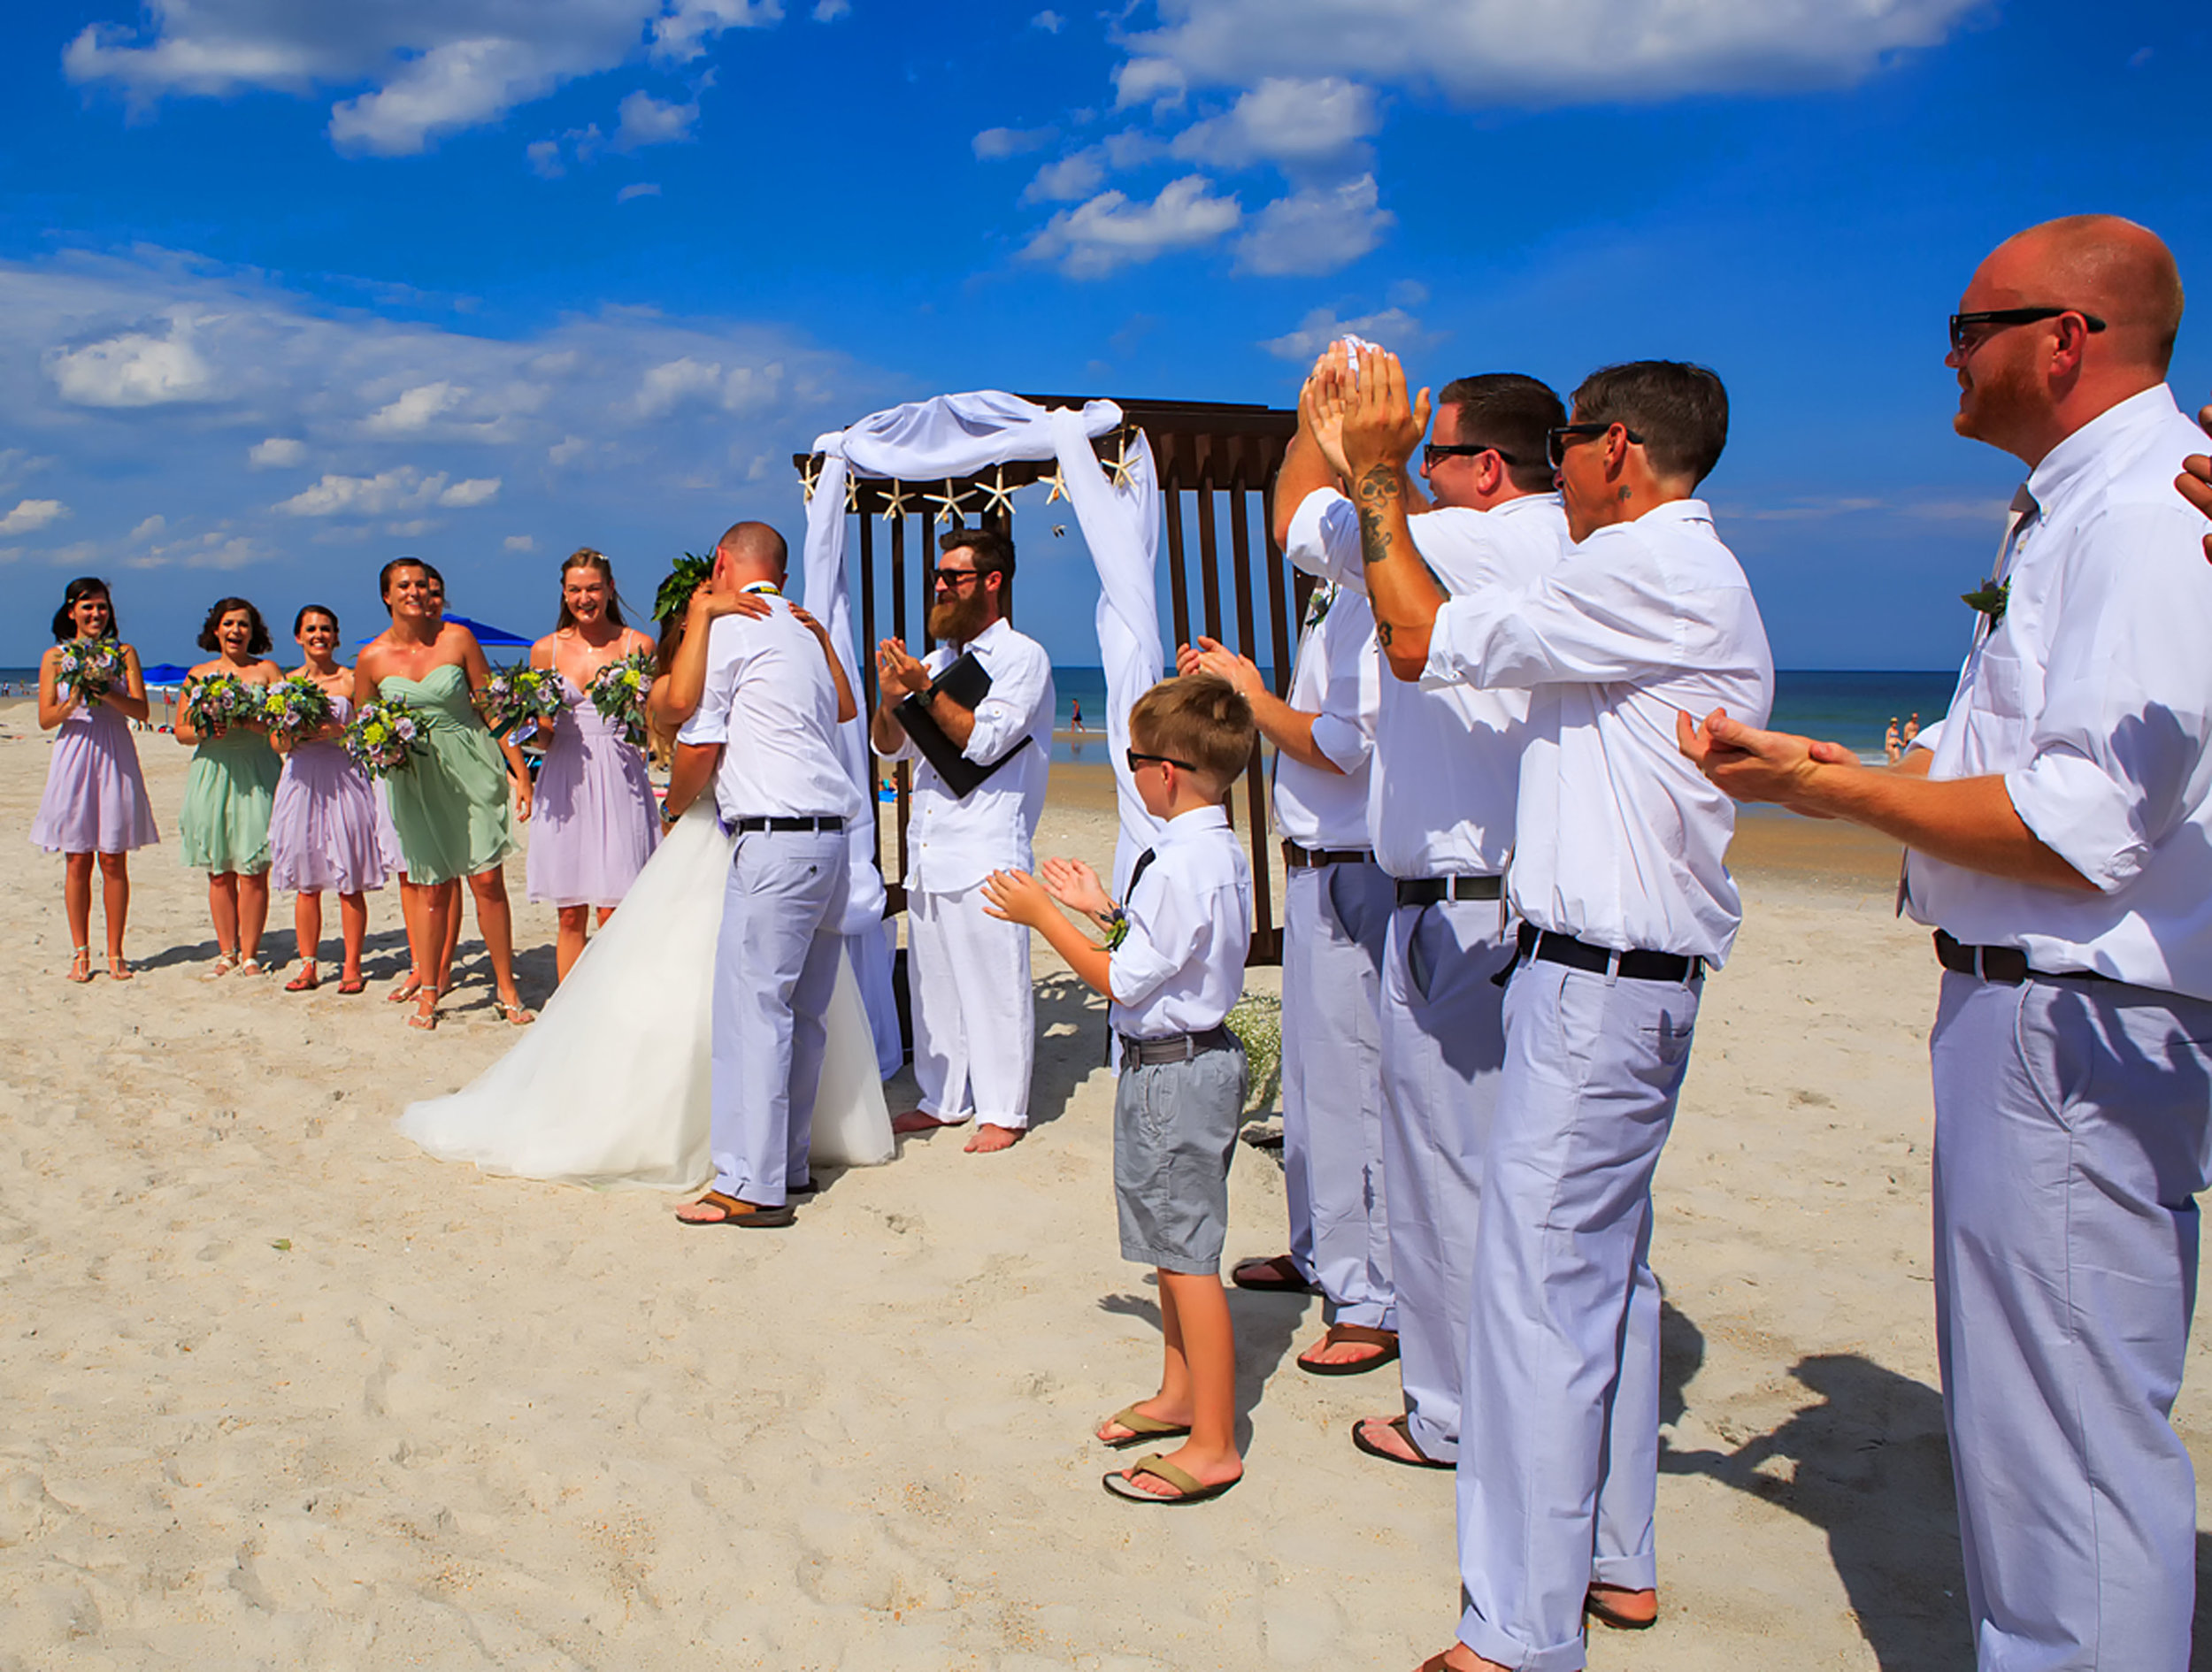 North_Carolina_Wedding_Photographer_Tiffany_Abruzzo_Ceremony_70.jpg